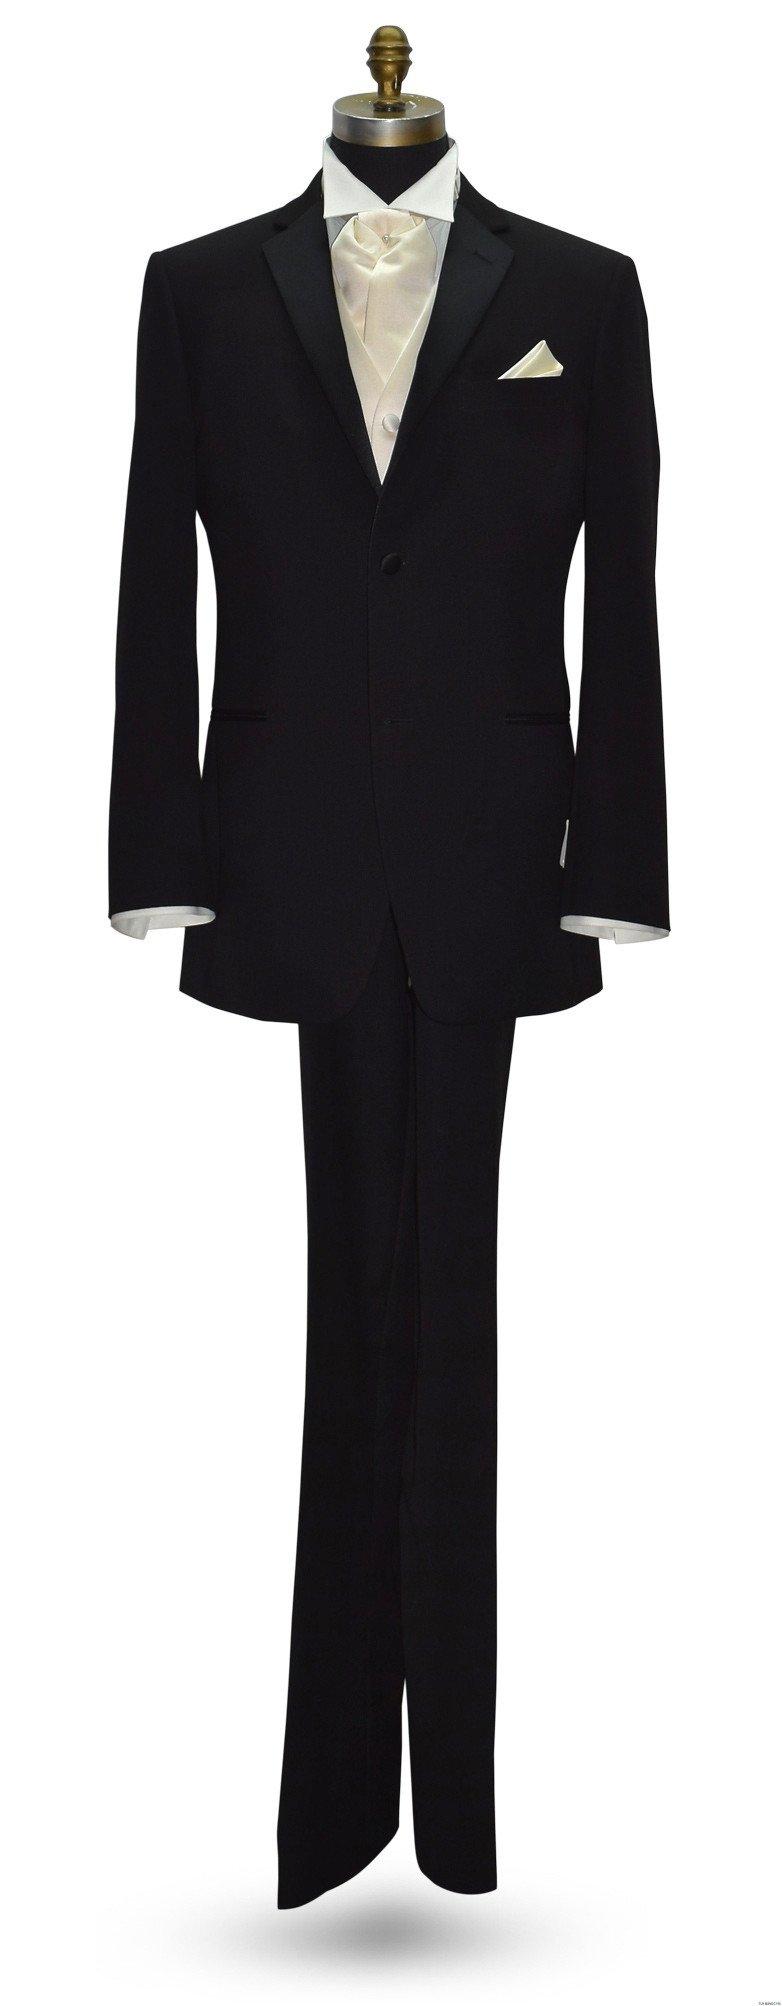 men's black tuxedo with ivory satin ascot and ivory satin vest